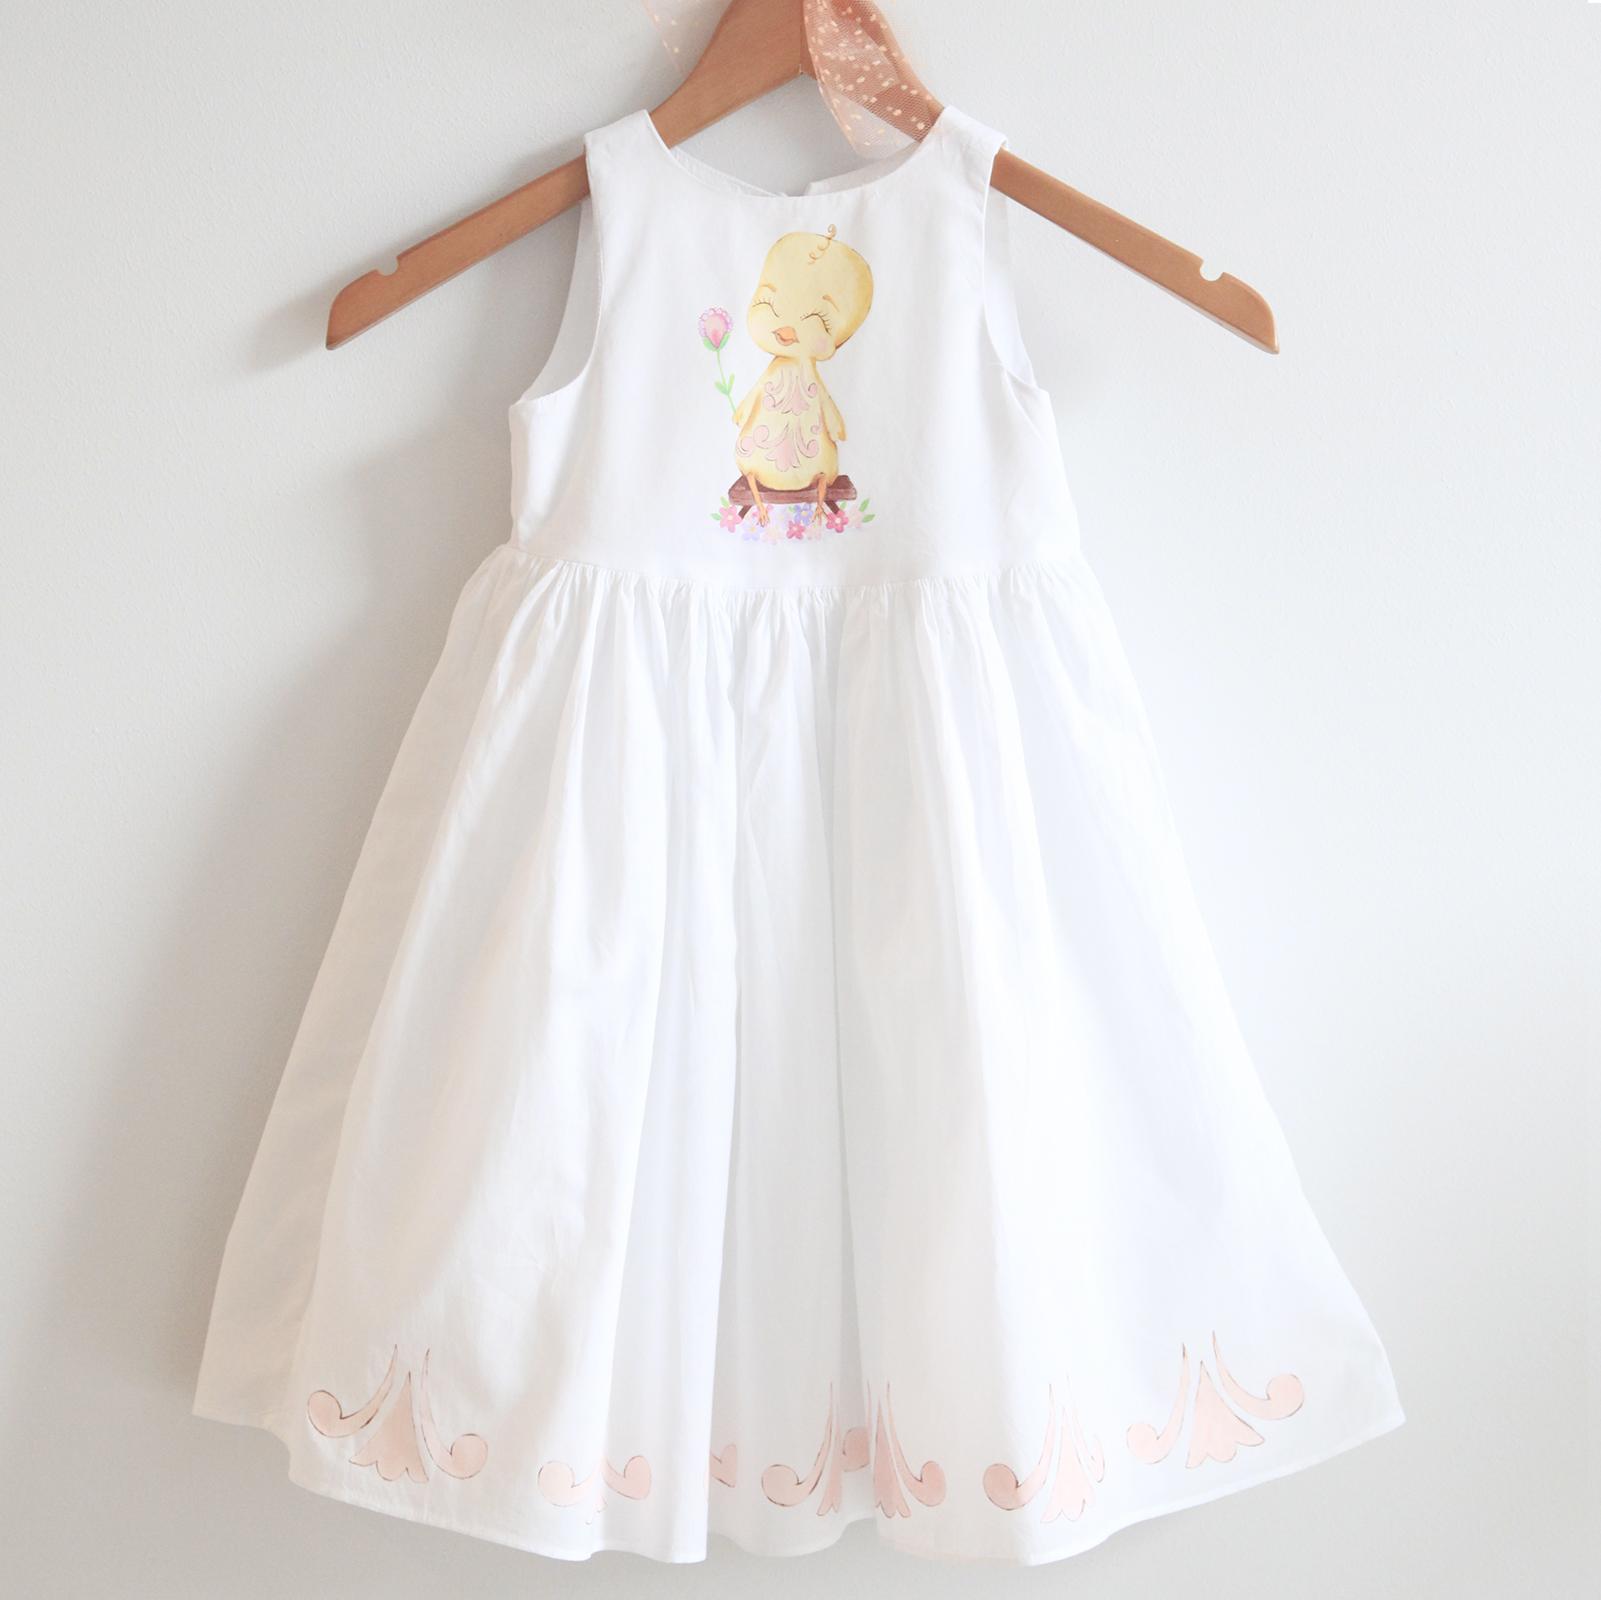 mayla_dress_1.jpg